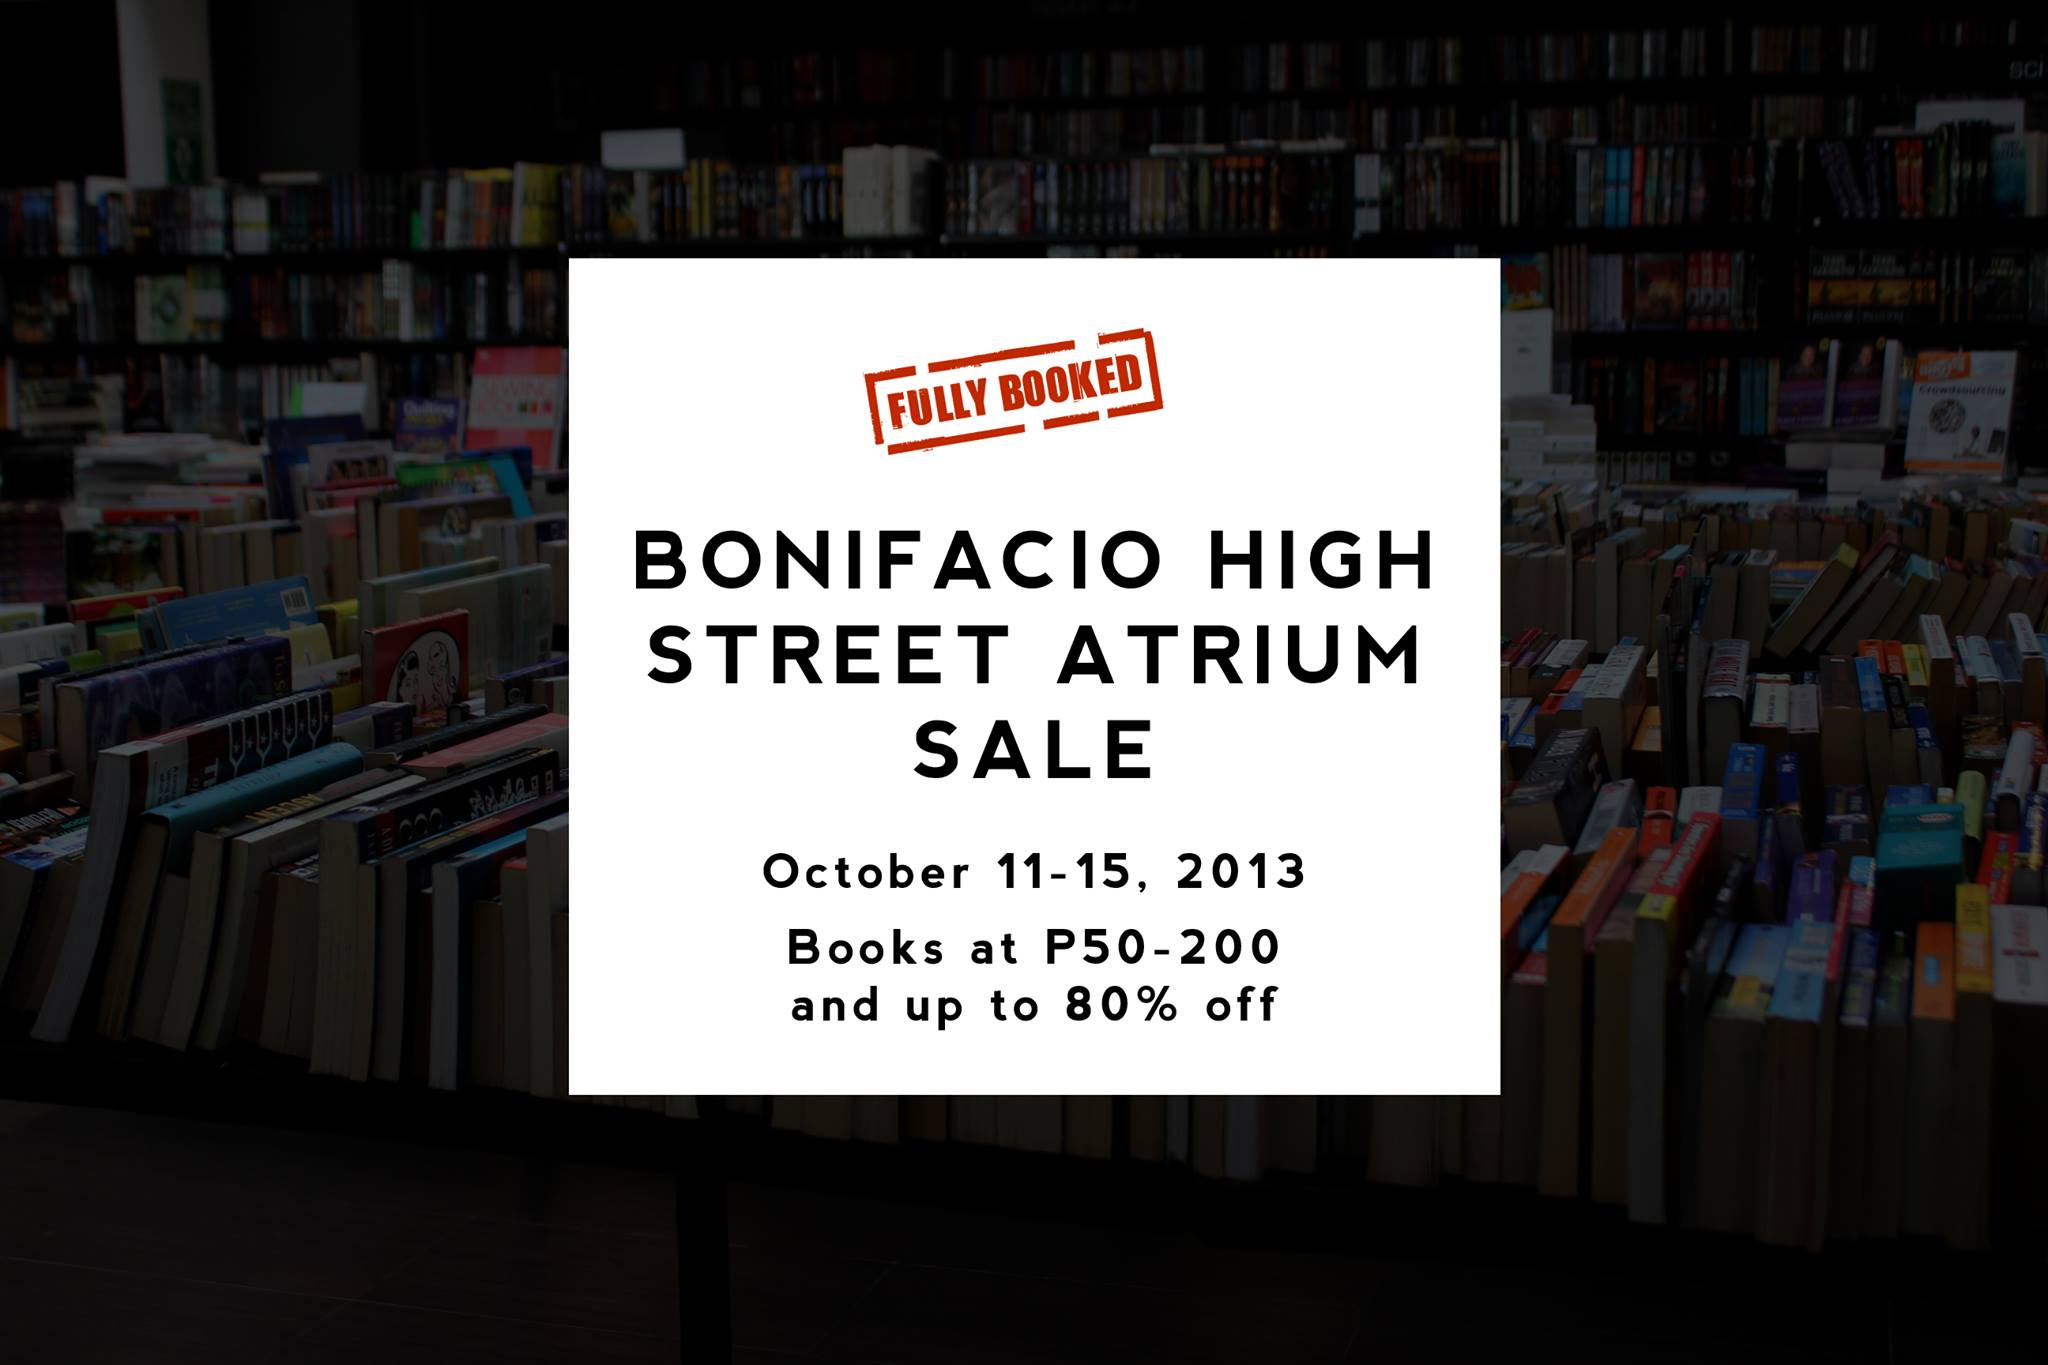 Fully Booked Atrium Sale @ Bonifacio High Street October 2013